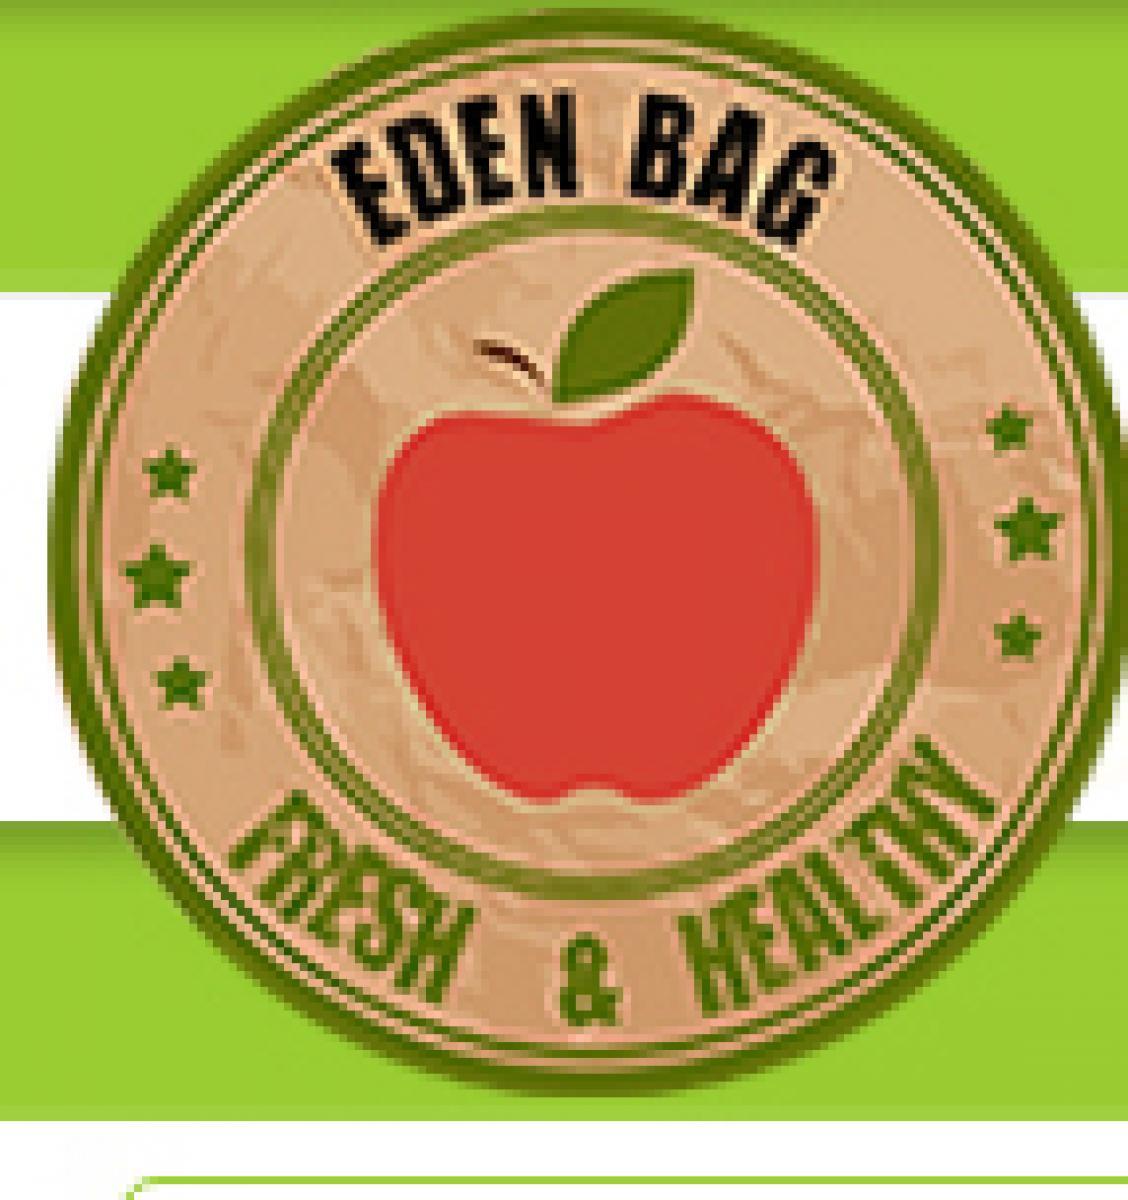 Eden Bag, an E-commerce portal for fruits and vegetables